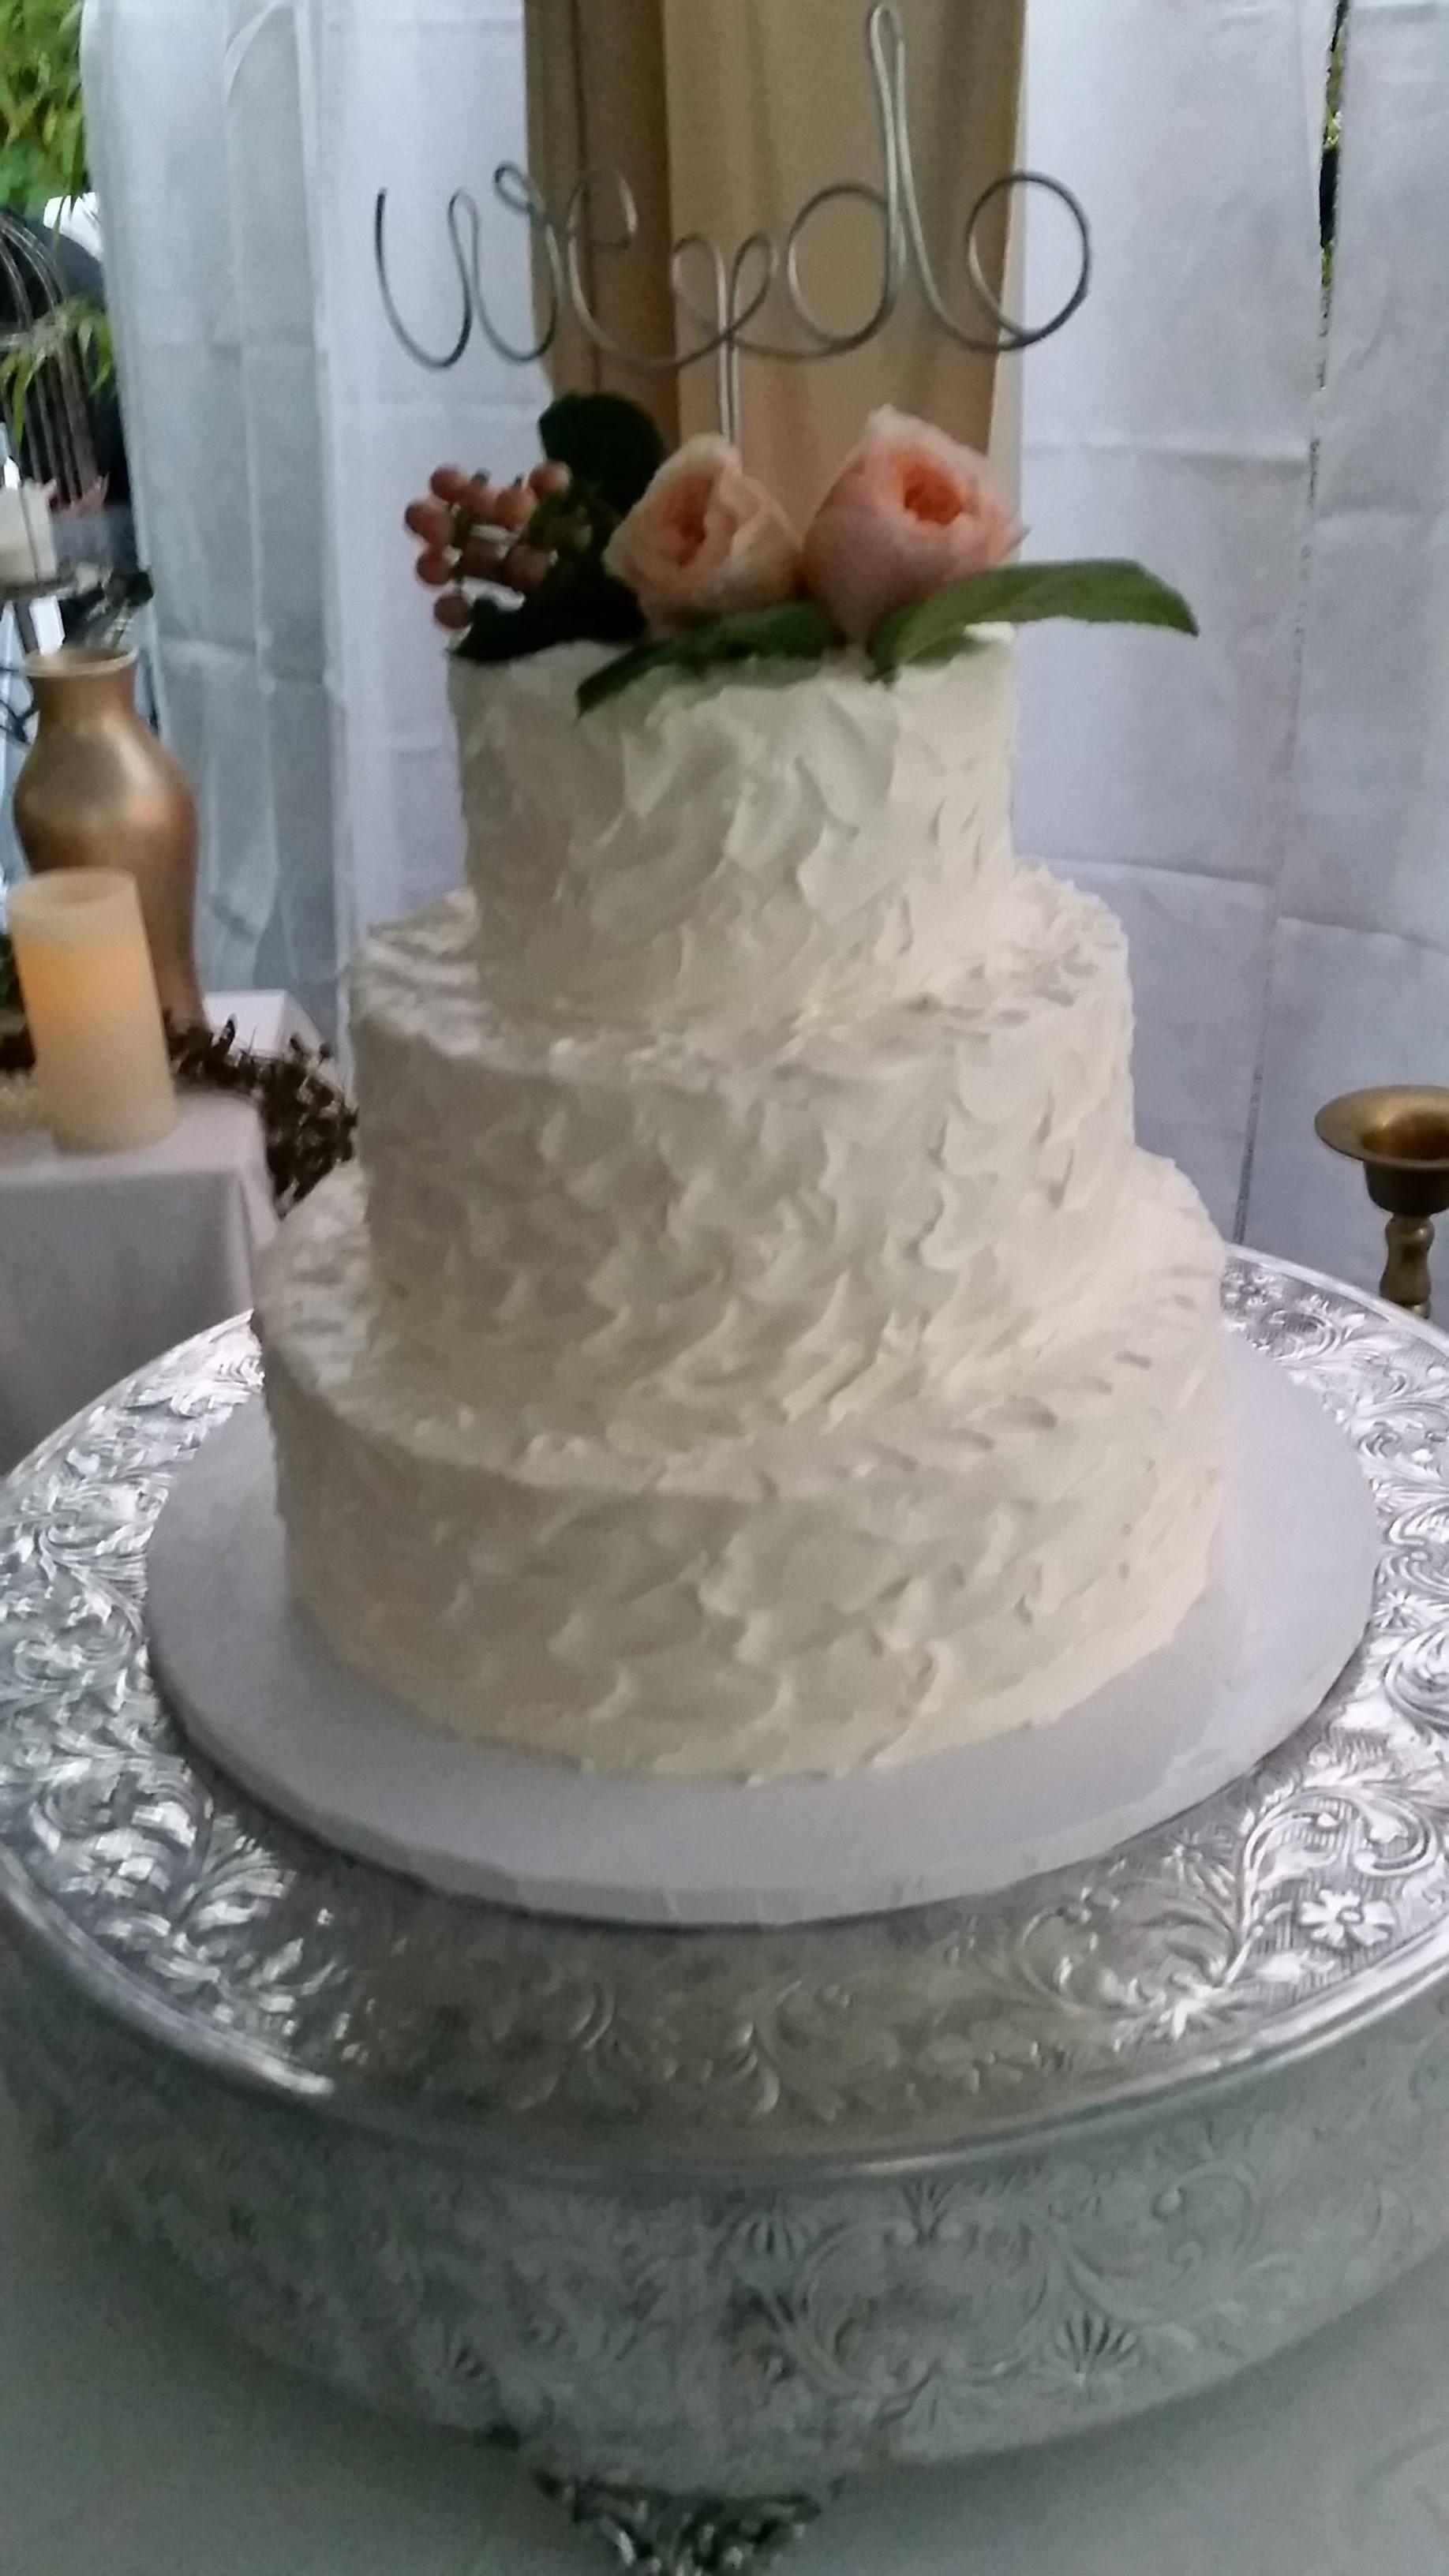 Chameleon Event & Wedding Cakes